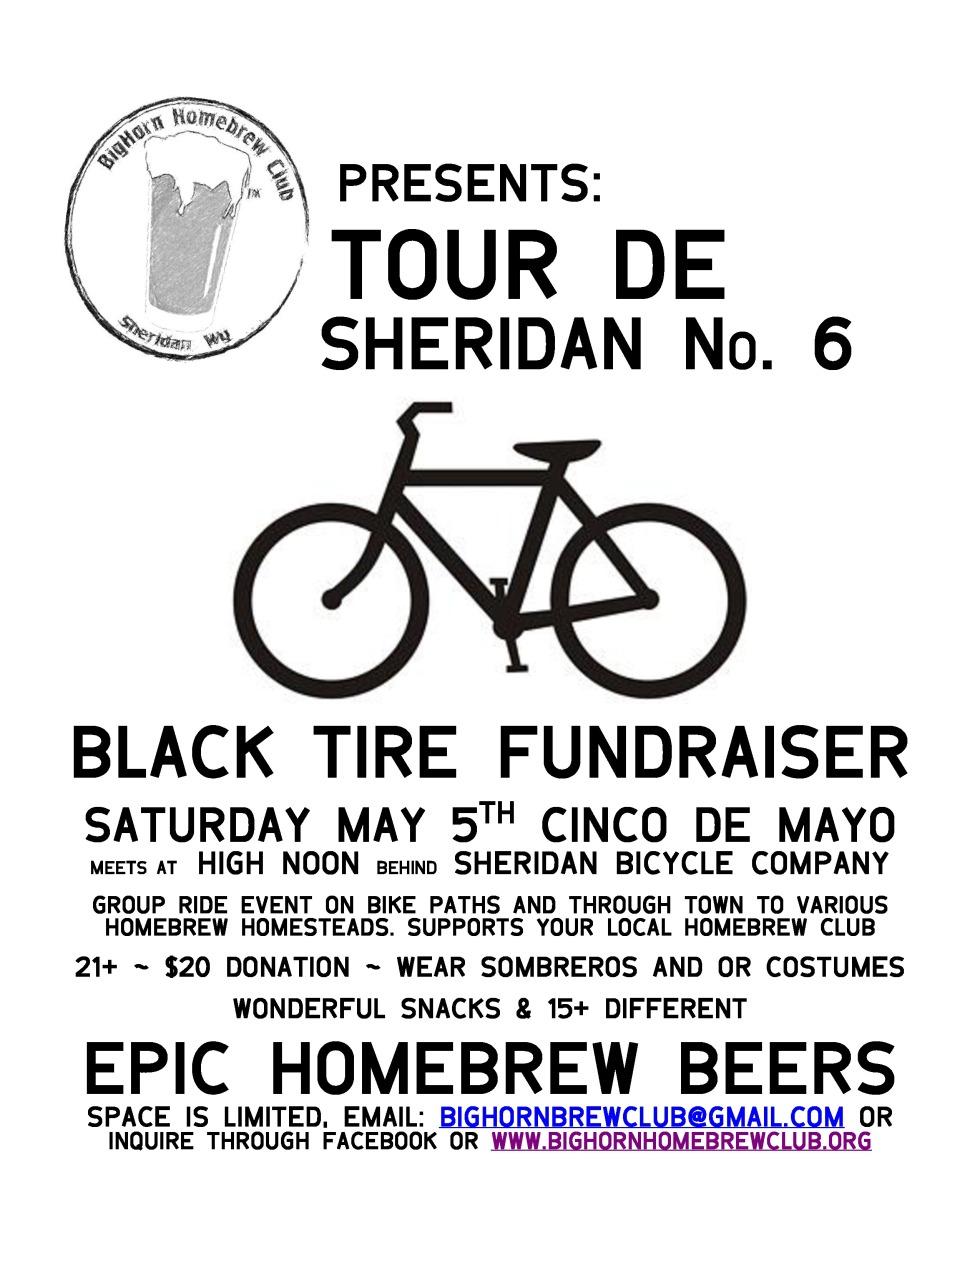 Tour De Sheridan No 6 poster-page-0 (2)